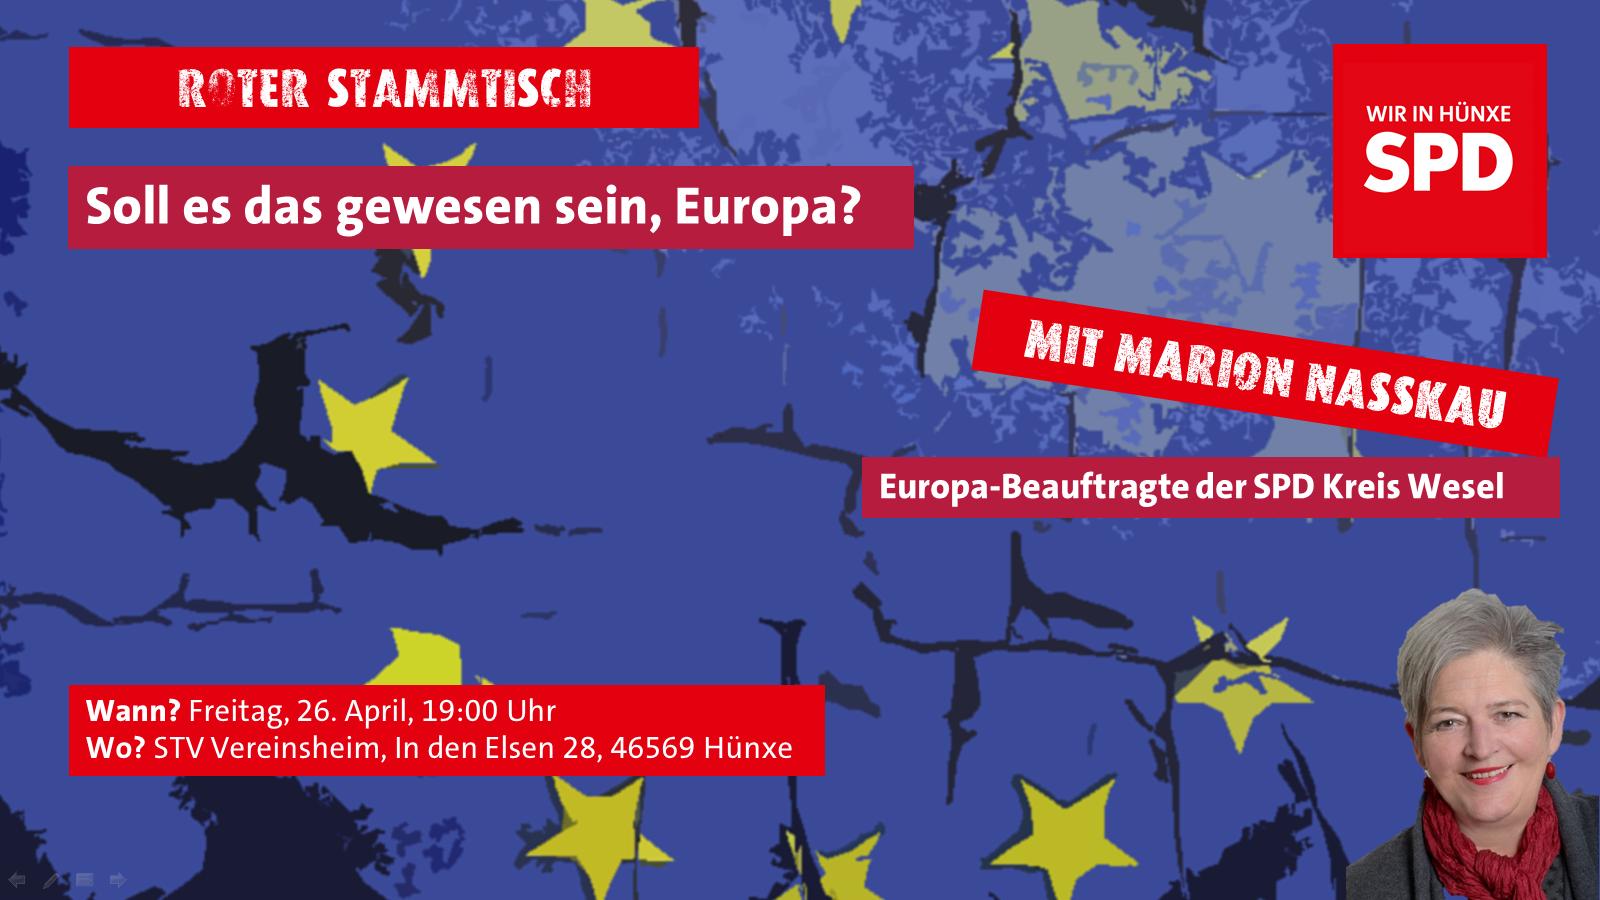 20190426 SharePic_RoterStammtischEuropa